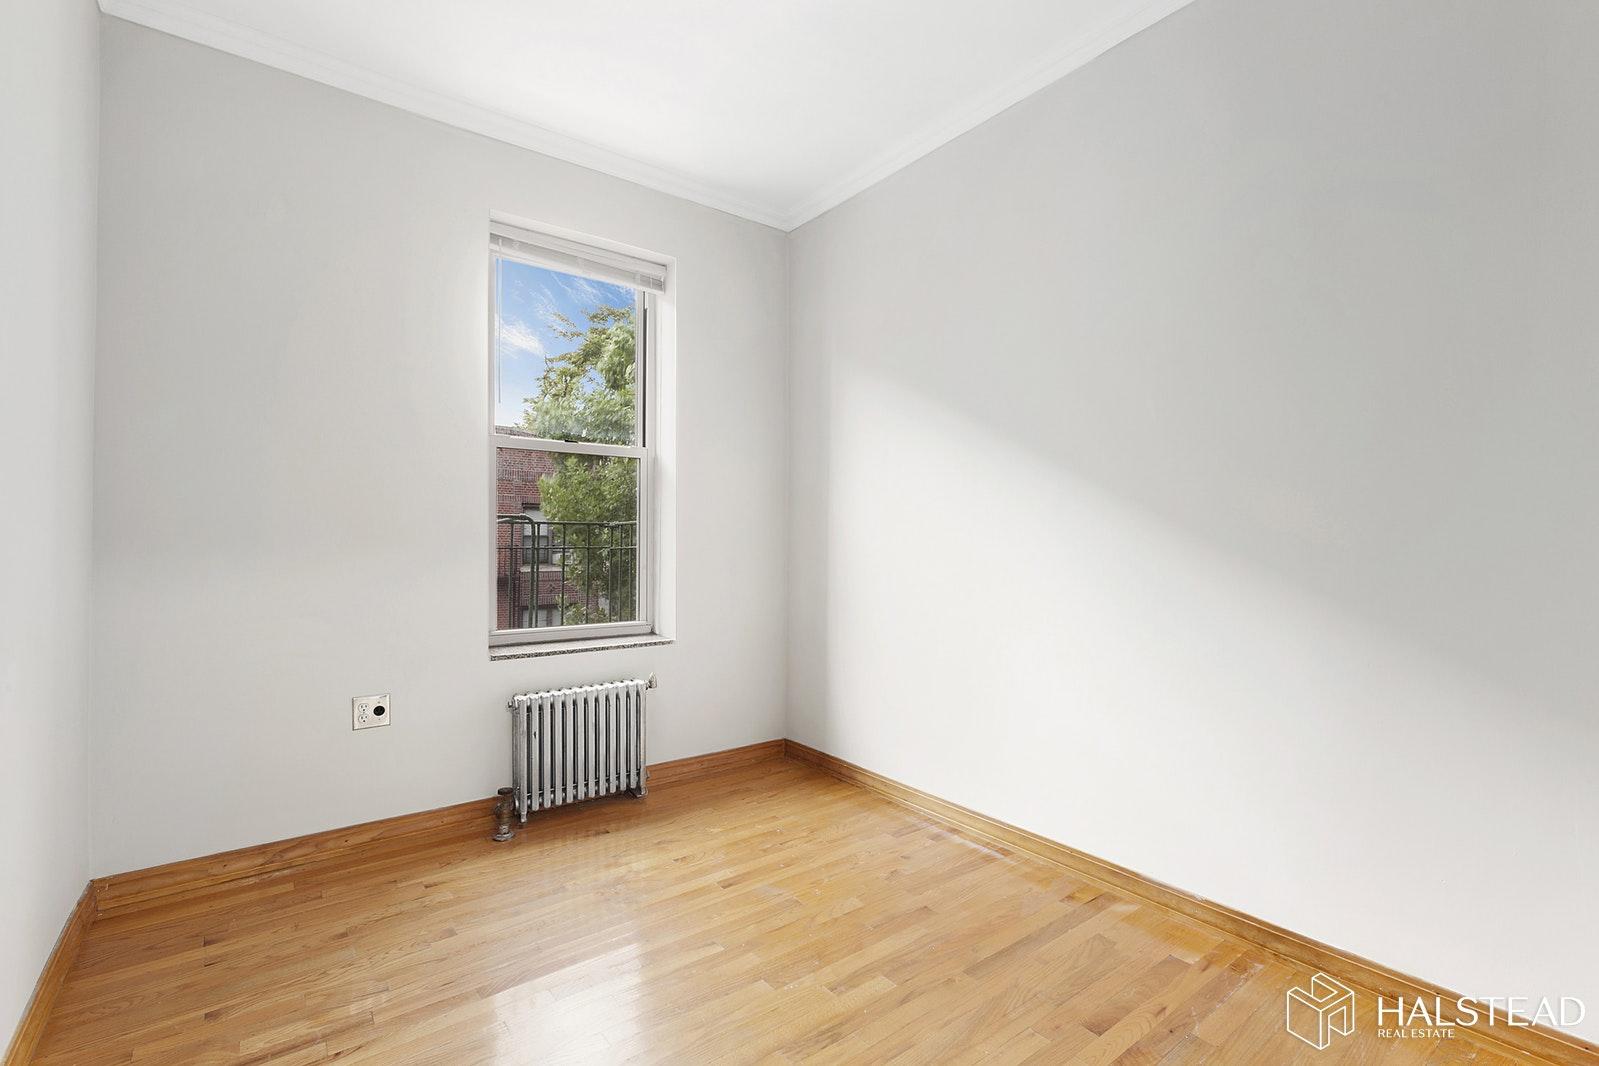 31 -11 35TH STREET 3R, Astoria, $2,300, Web #: 19943413